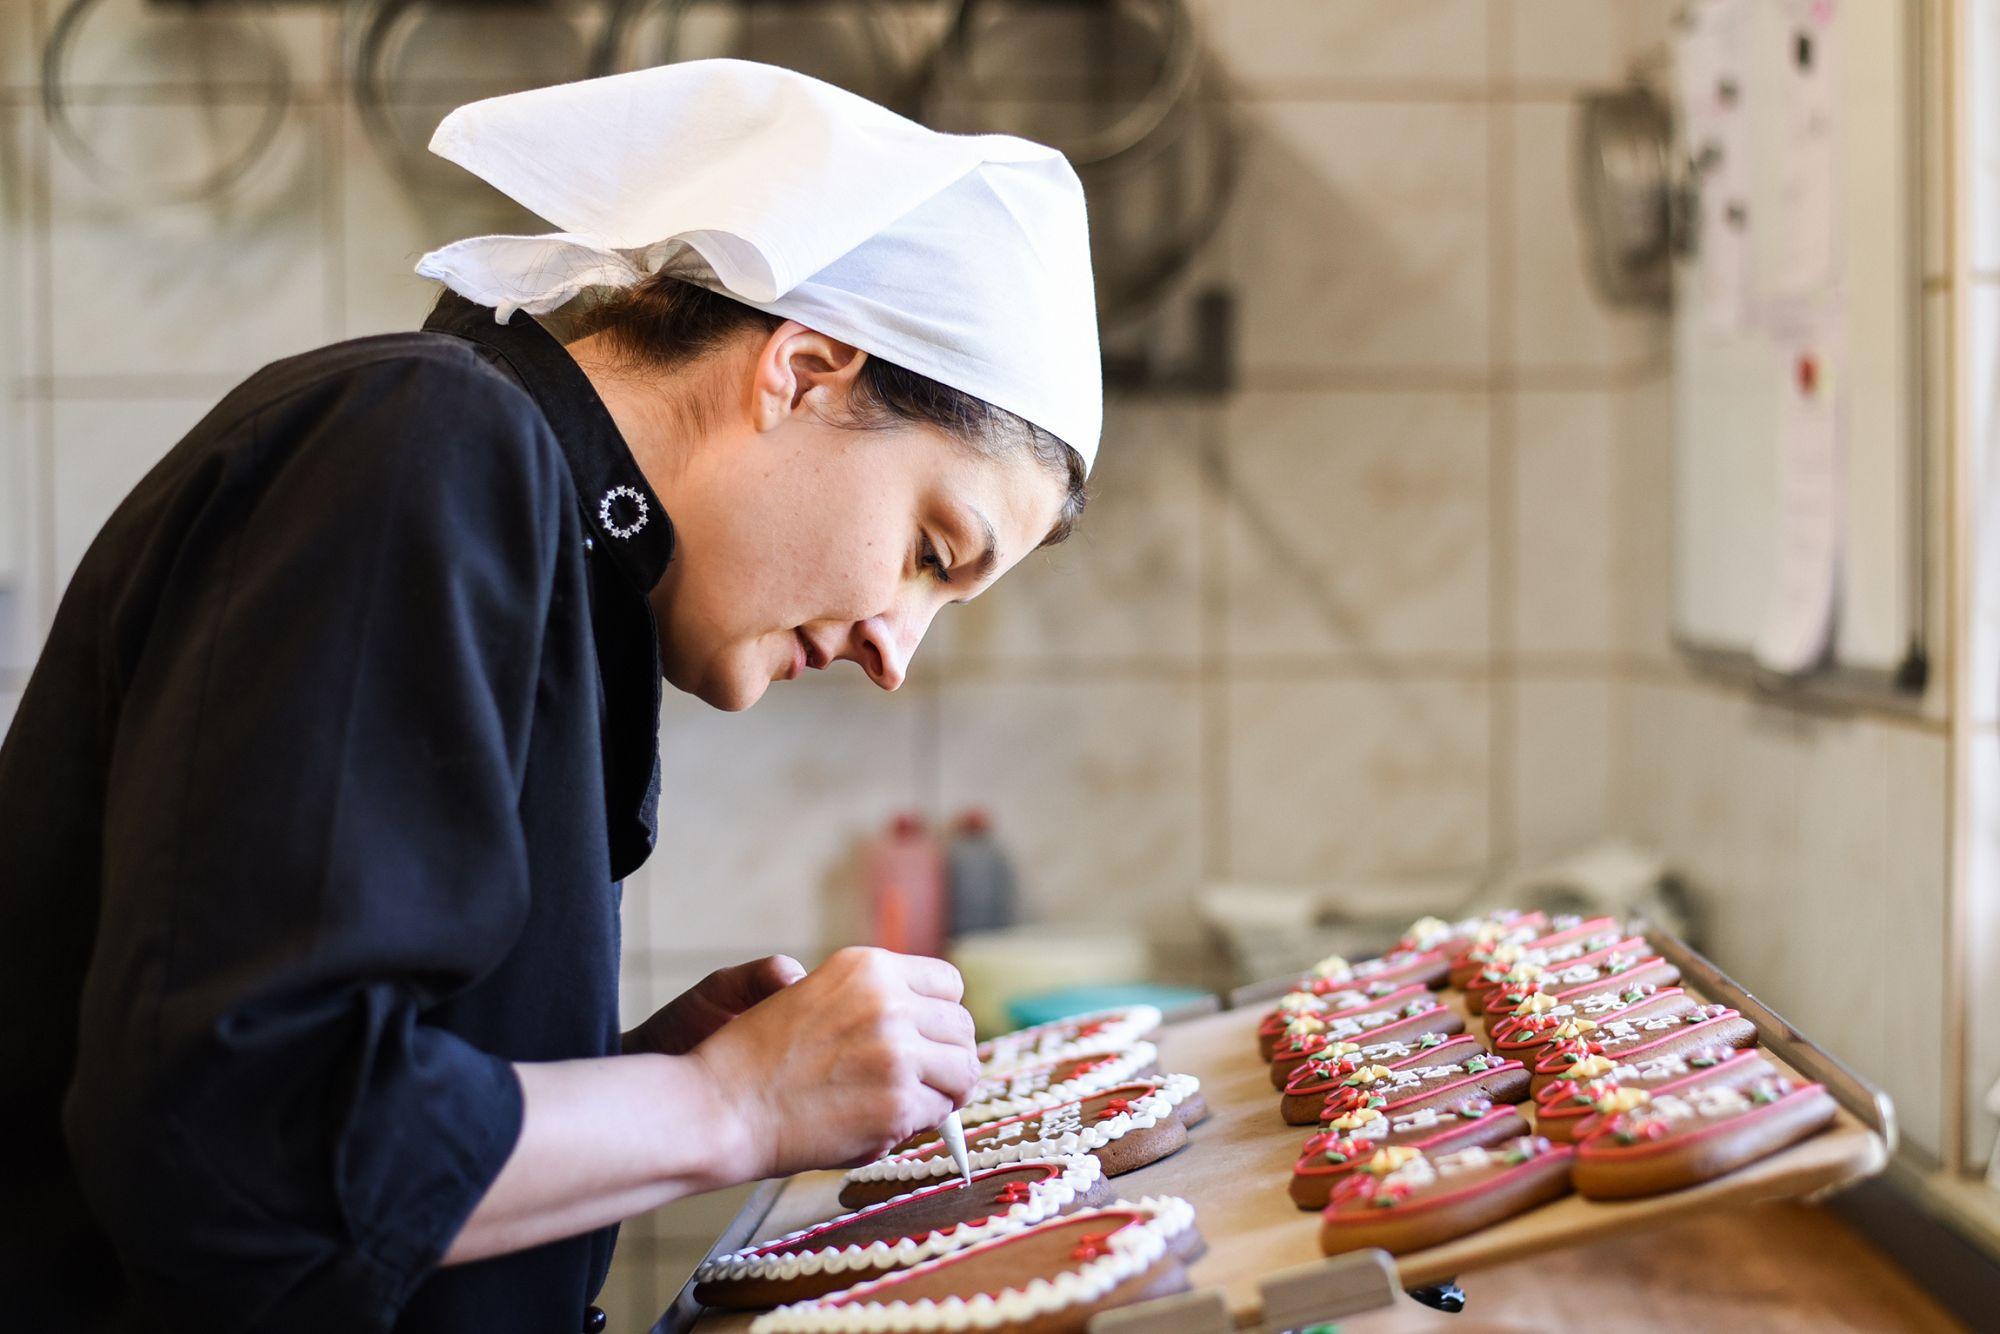 Herzen Firmenservice - Ausseer Lebkuchen